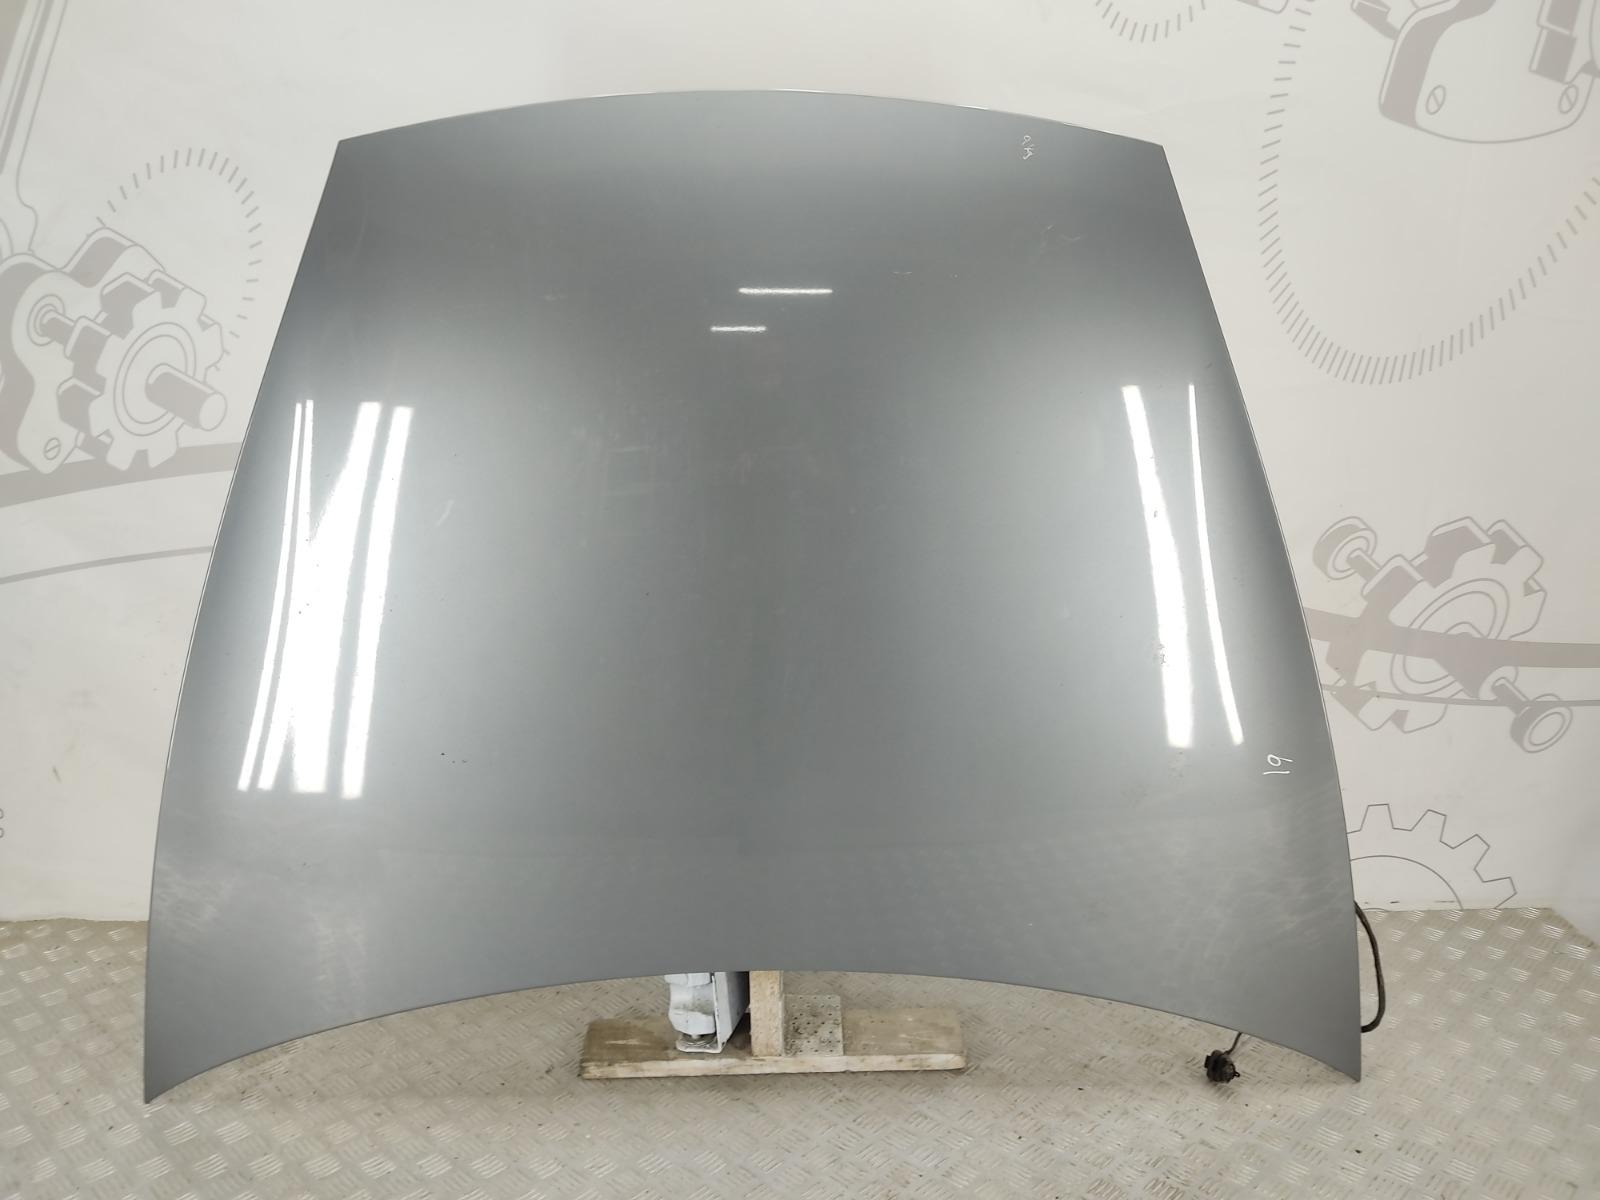 Капот Porsche Cayenne 955 4.5 I 2003 (б/у)